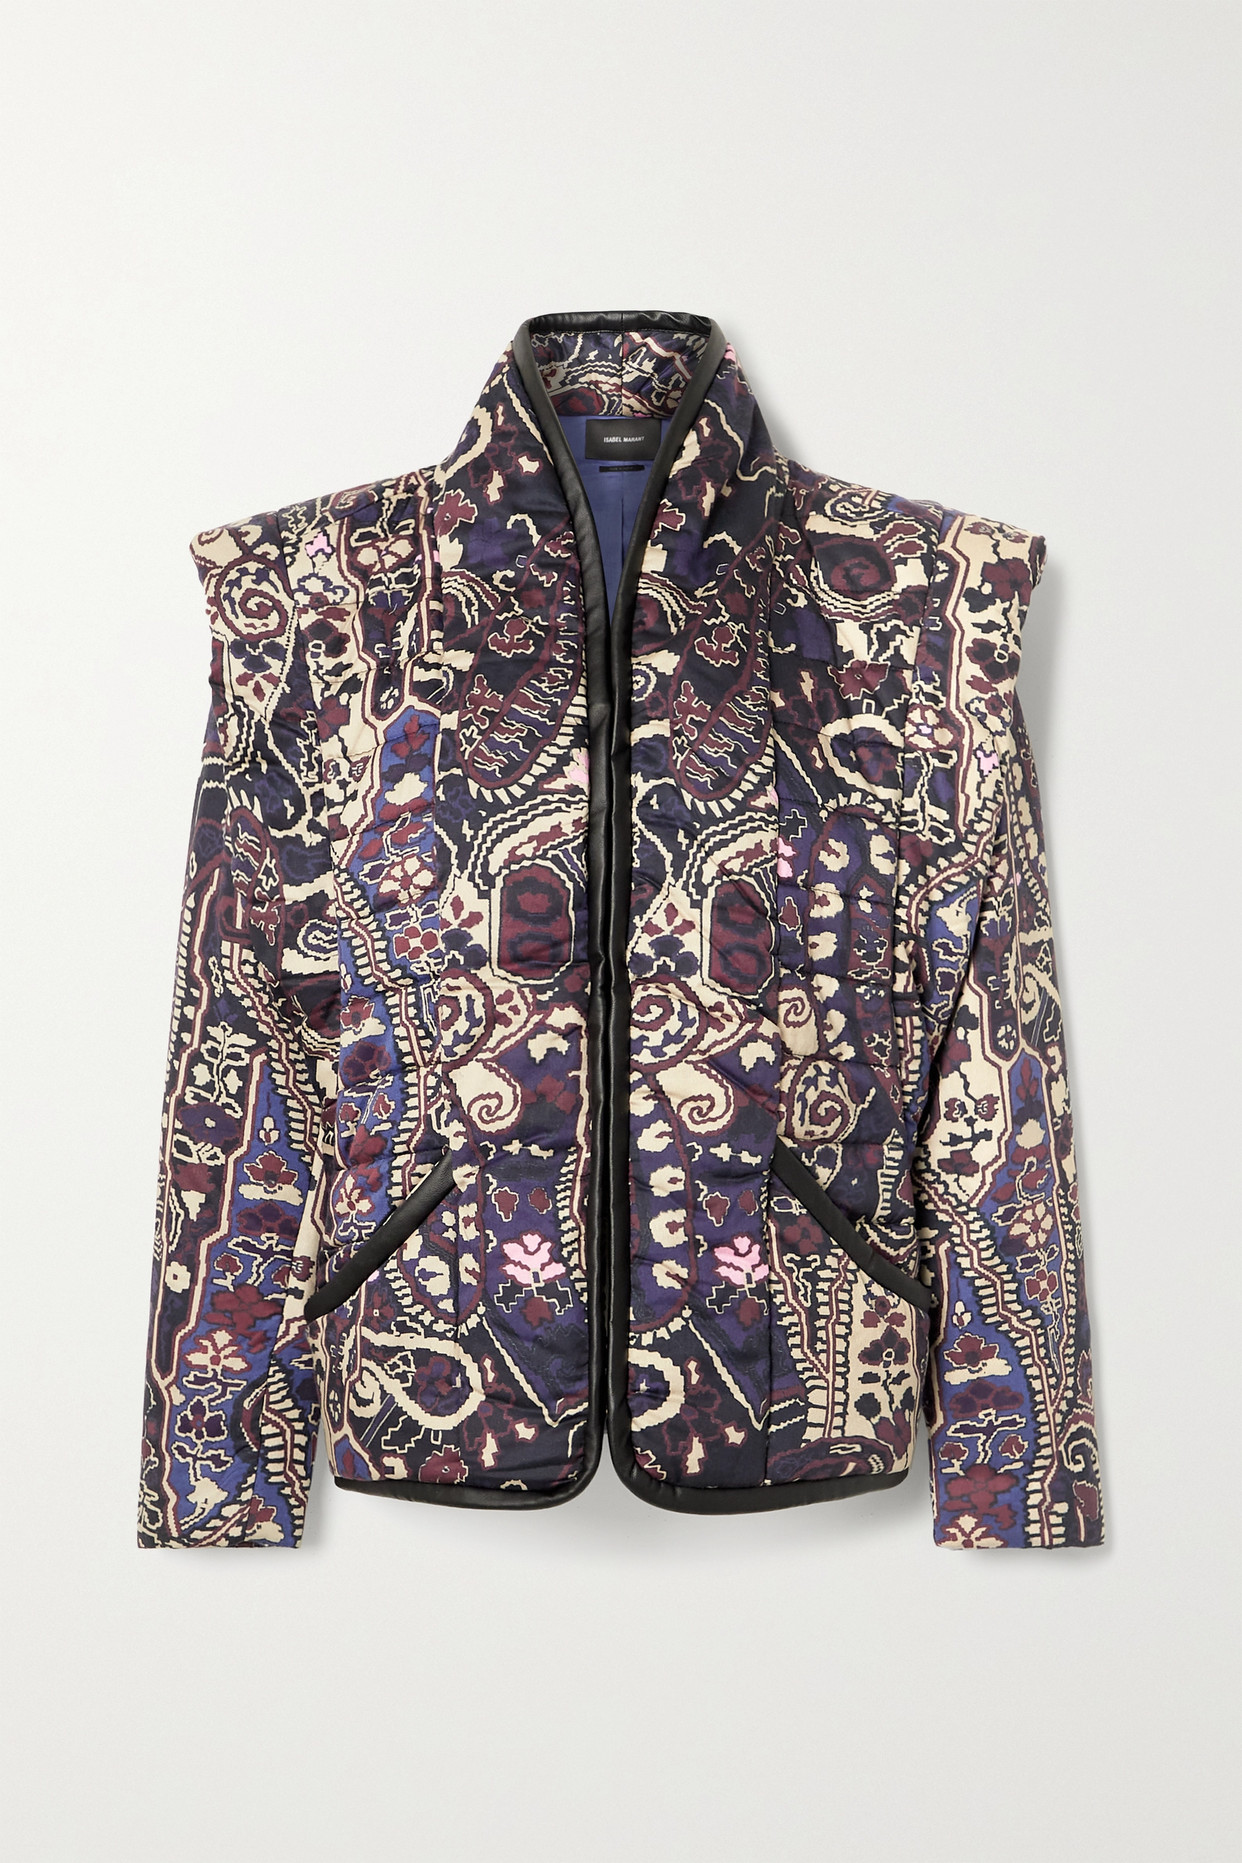 ISABEL MARANT - Janissa Convertible Faux Leather-trimmed Floral-print Cotton Jacket - Blue - FR36